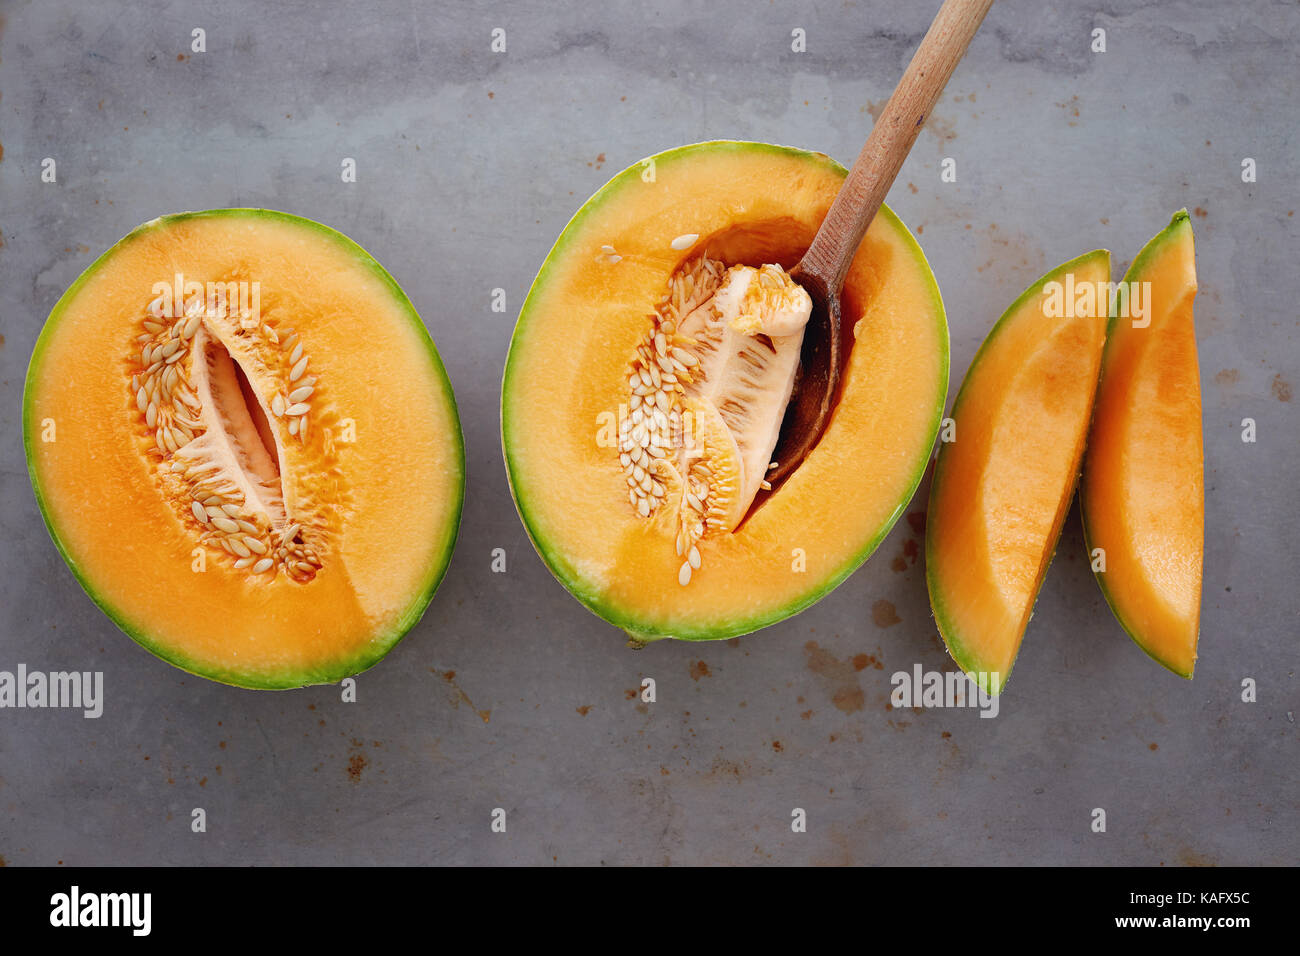 Melón fresco cortado en trozos. medio corte de melón maduro con una cuchara. Imagen De Stock